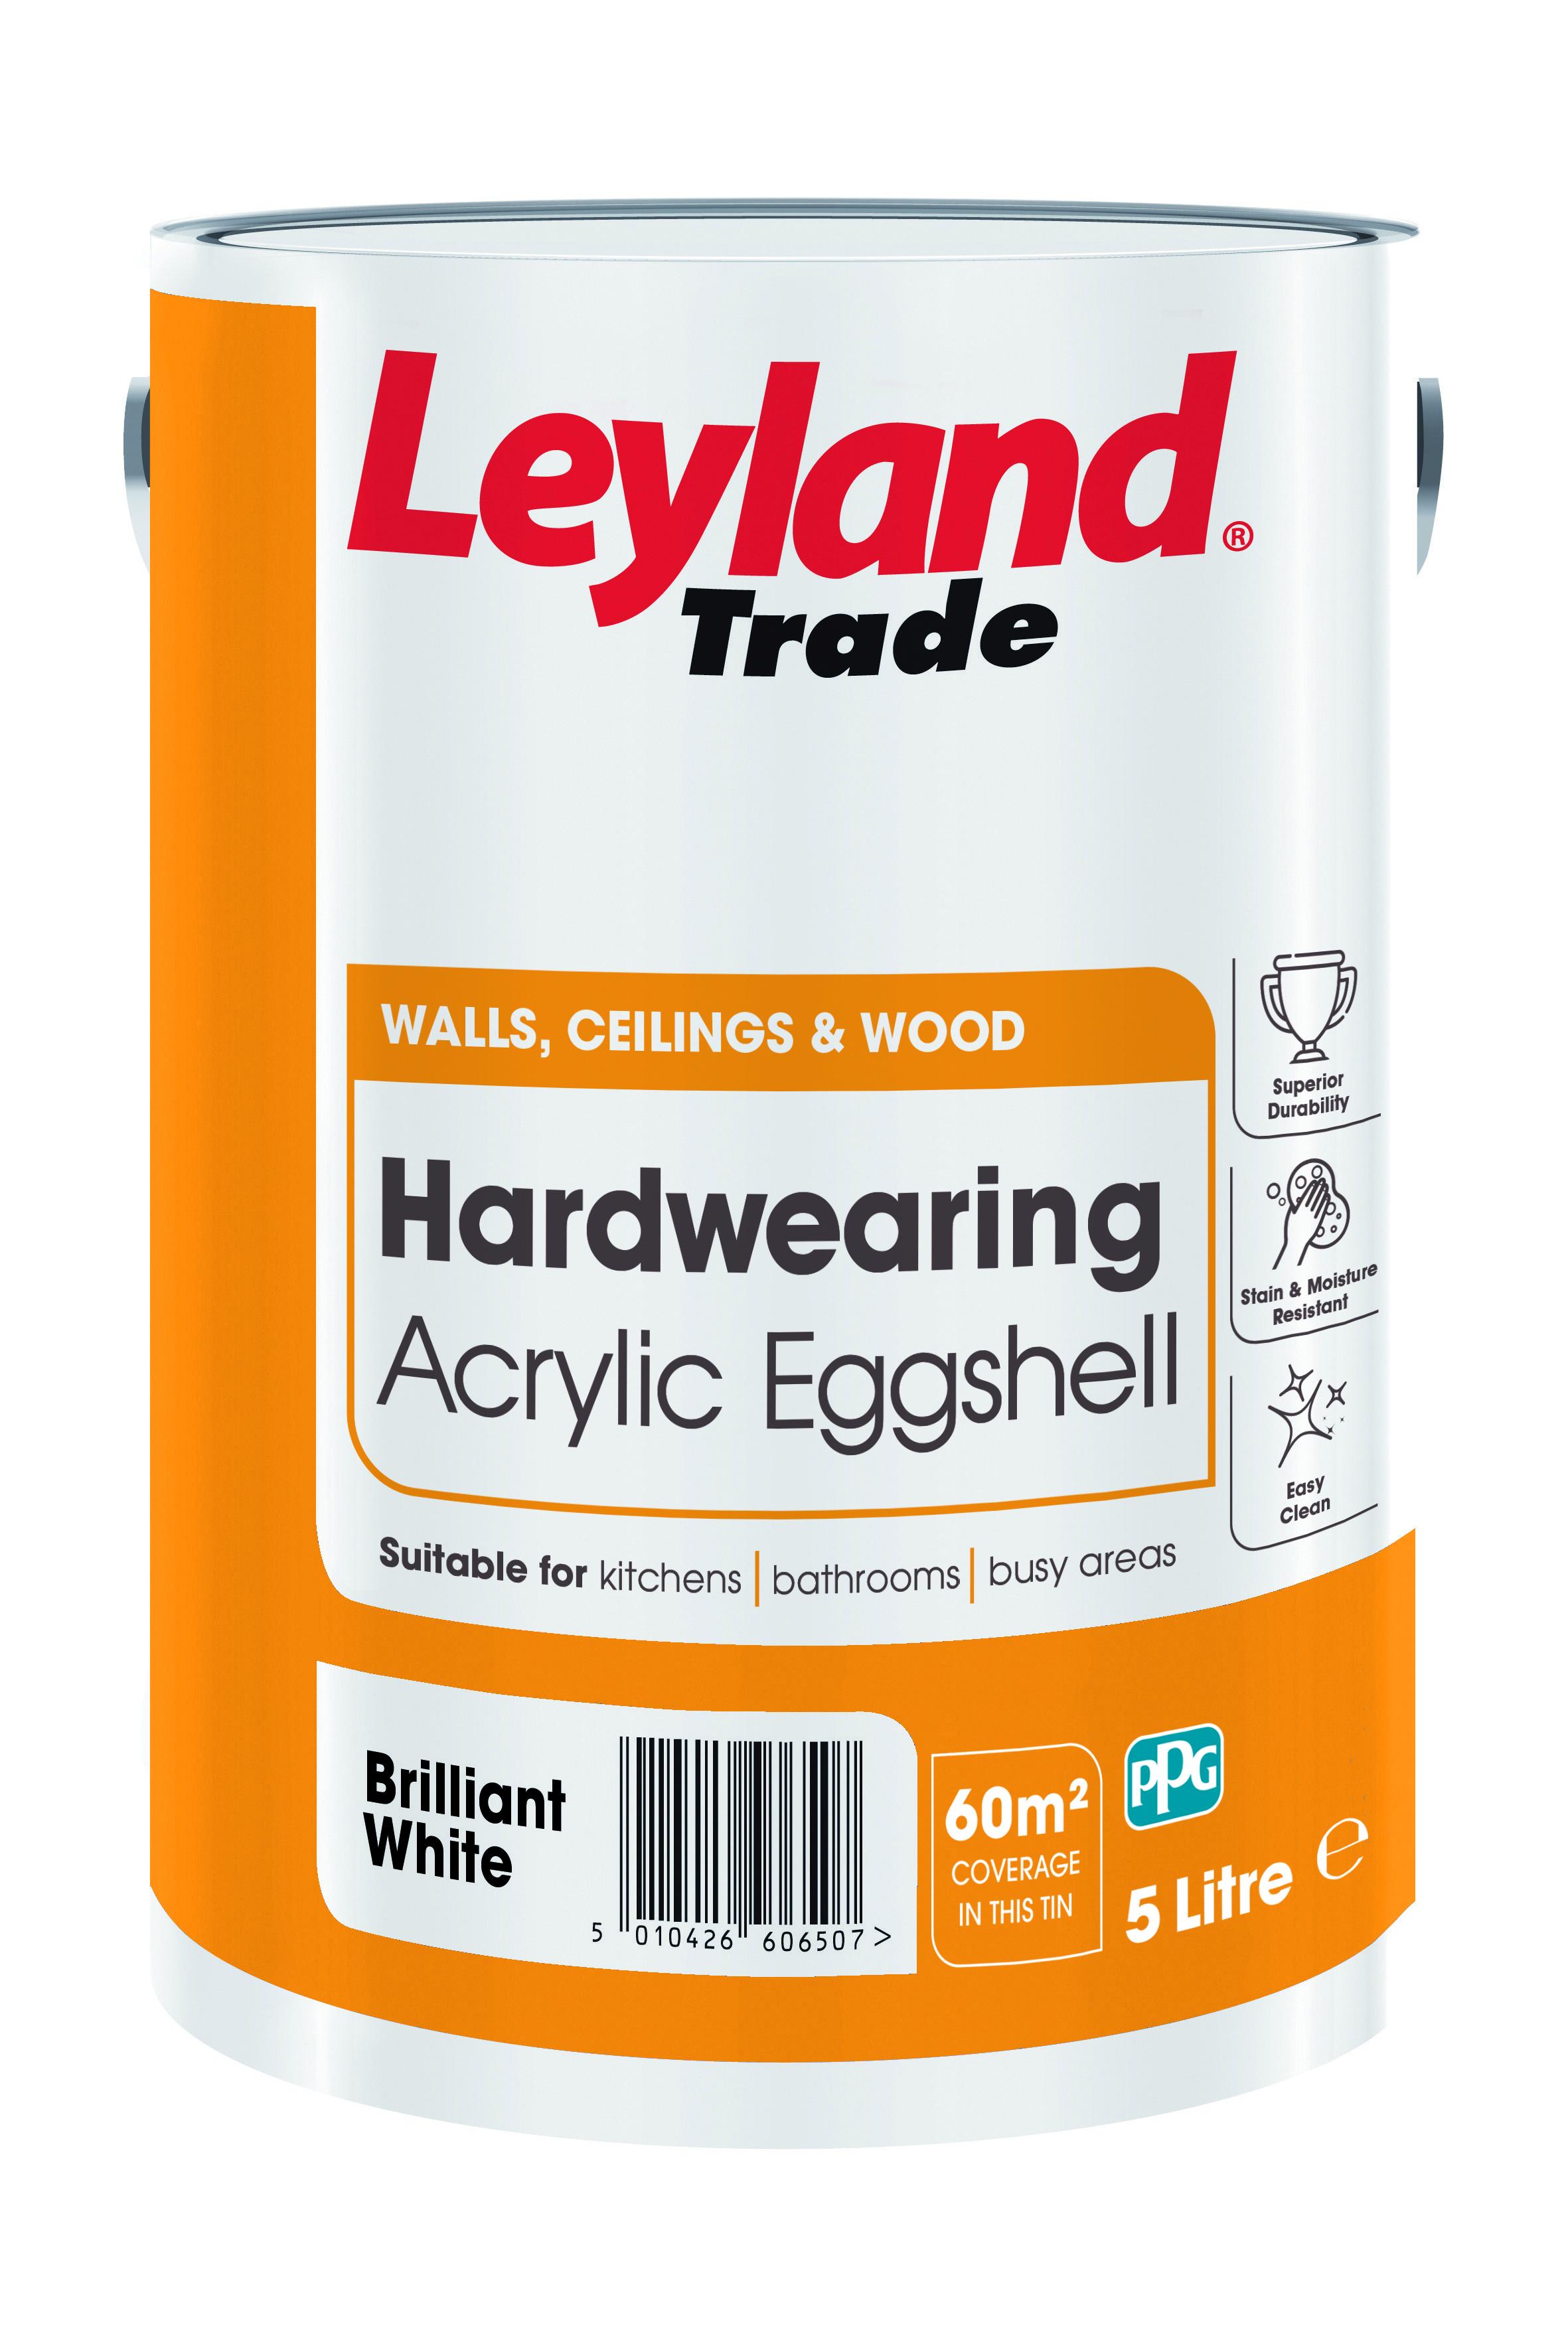 Hardwearing paint from Leyland Trade